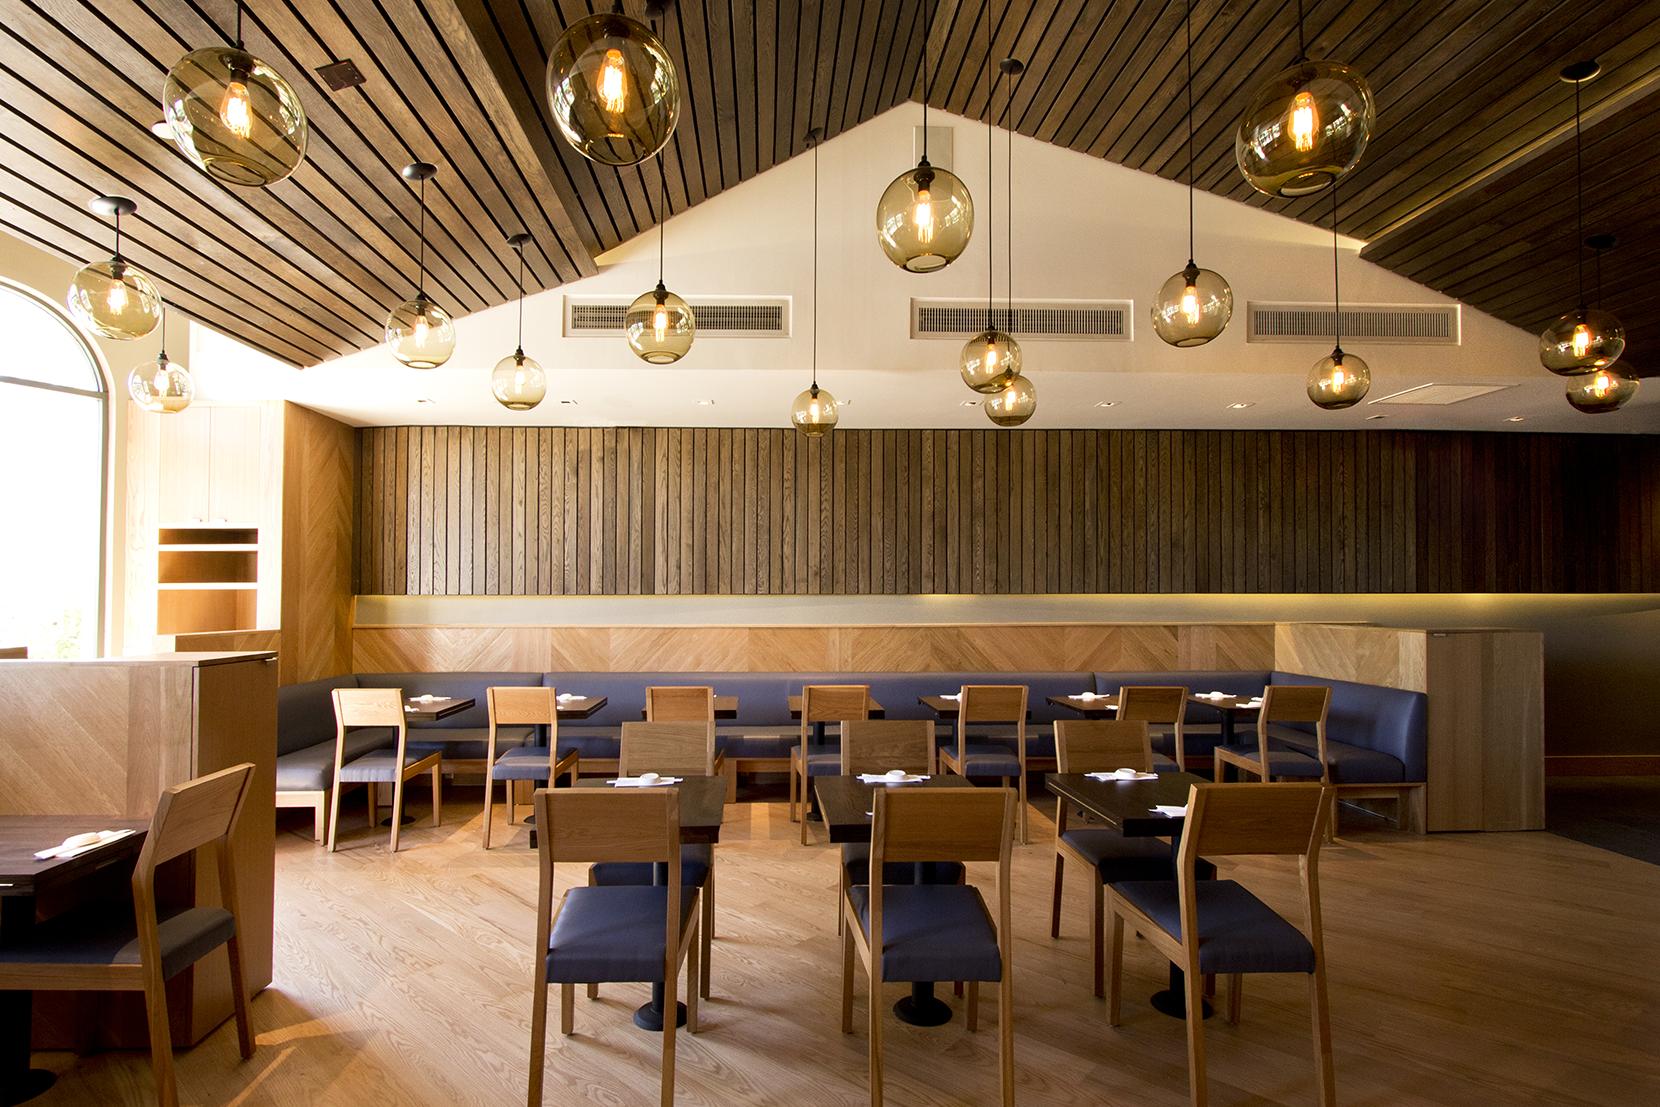 Modern Glass Restaurant Lighting - Smoke Solitaire Pendant Lights